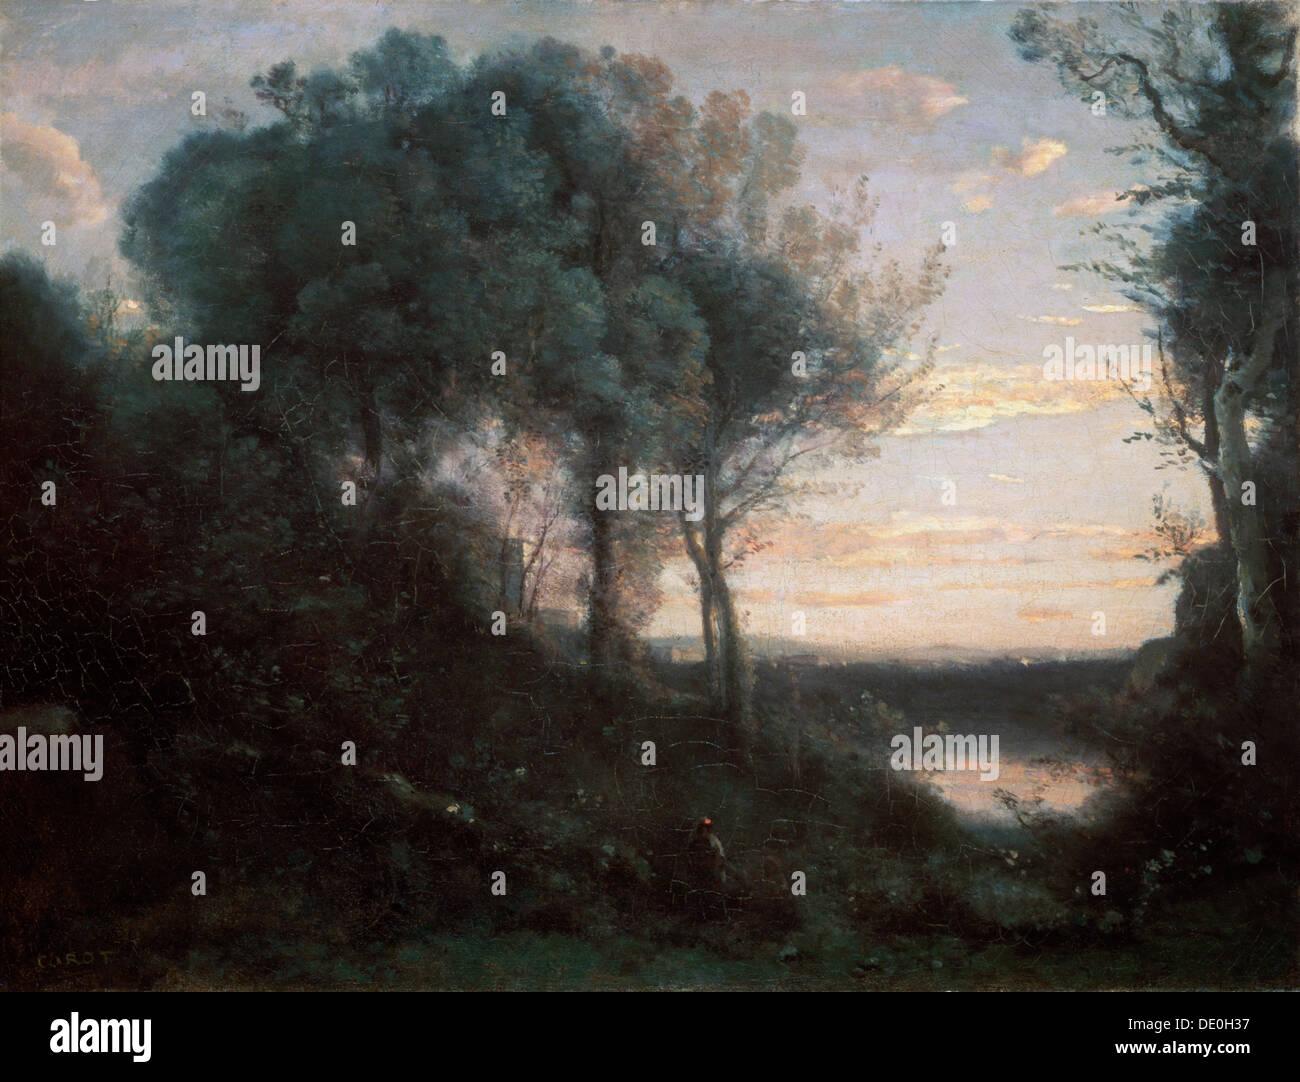 'Evening', 1850-1860s.  Artist: Jean-Baptiste-Camille Corot - Stock Image